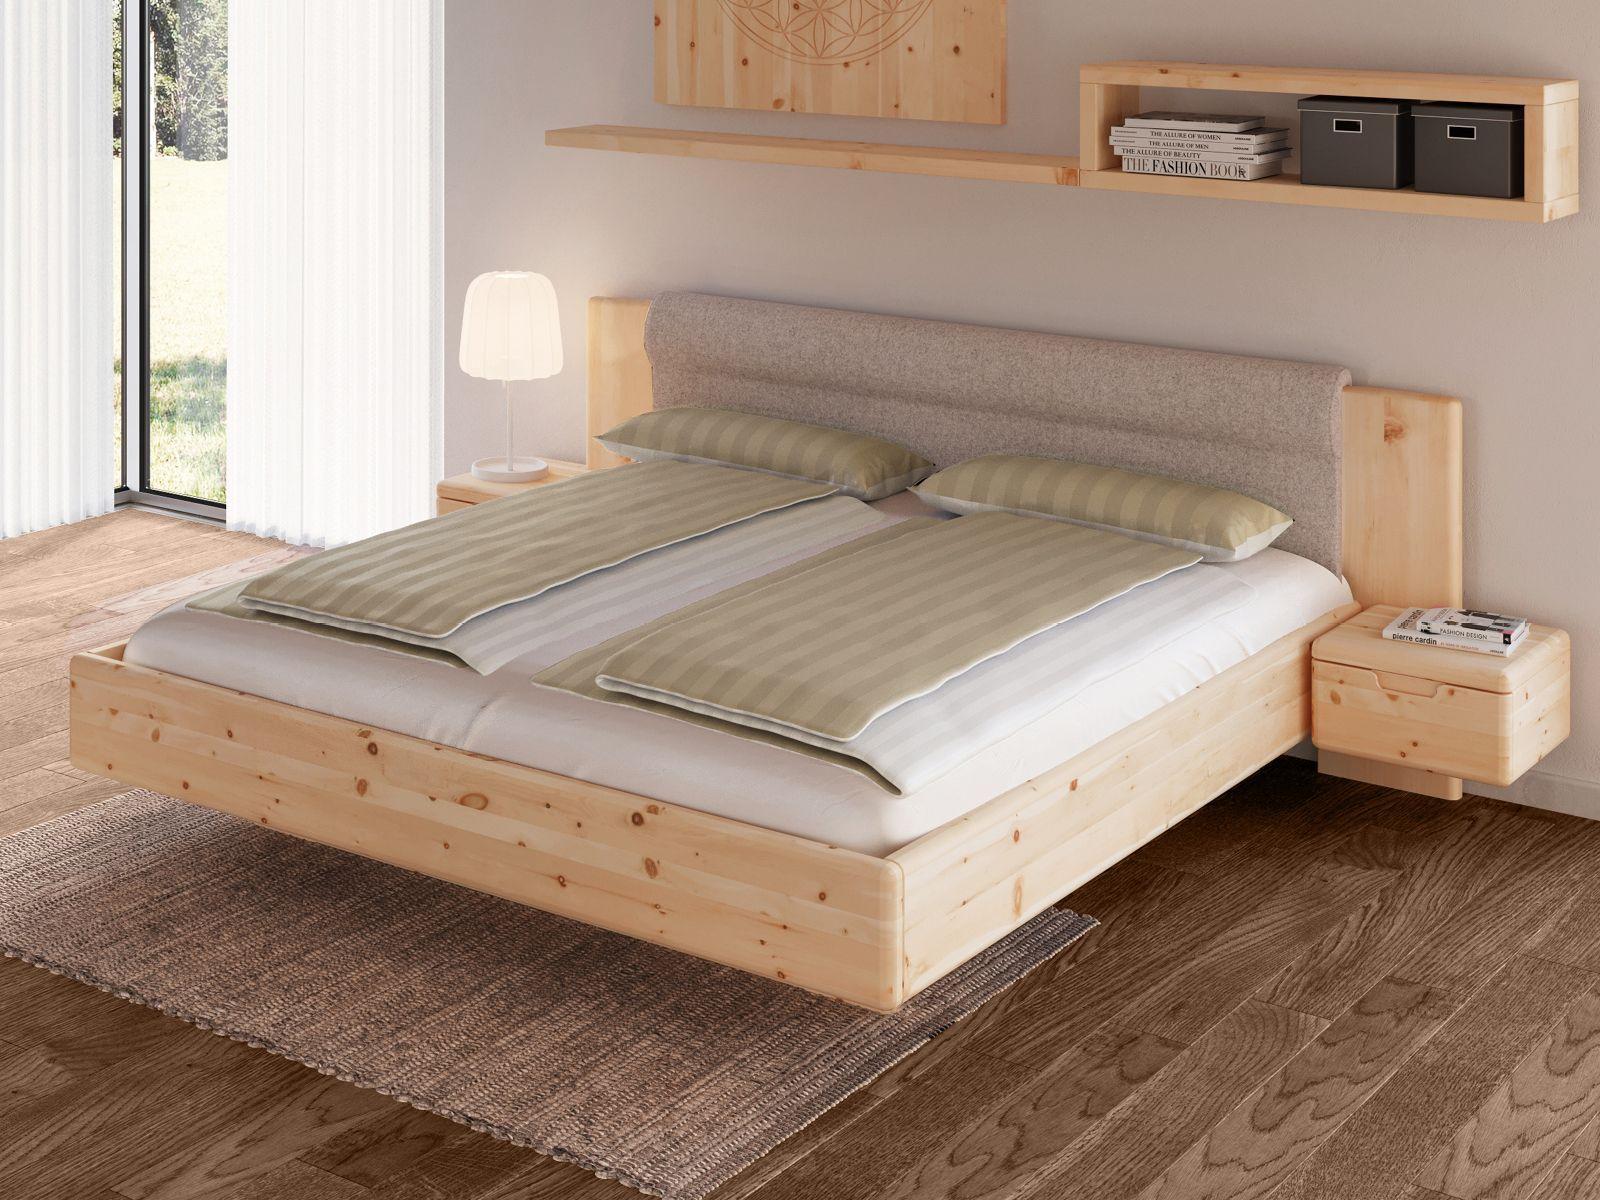 Zirbenholzbett Leonie Zirbenholz Bett Rustikale